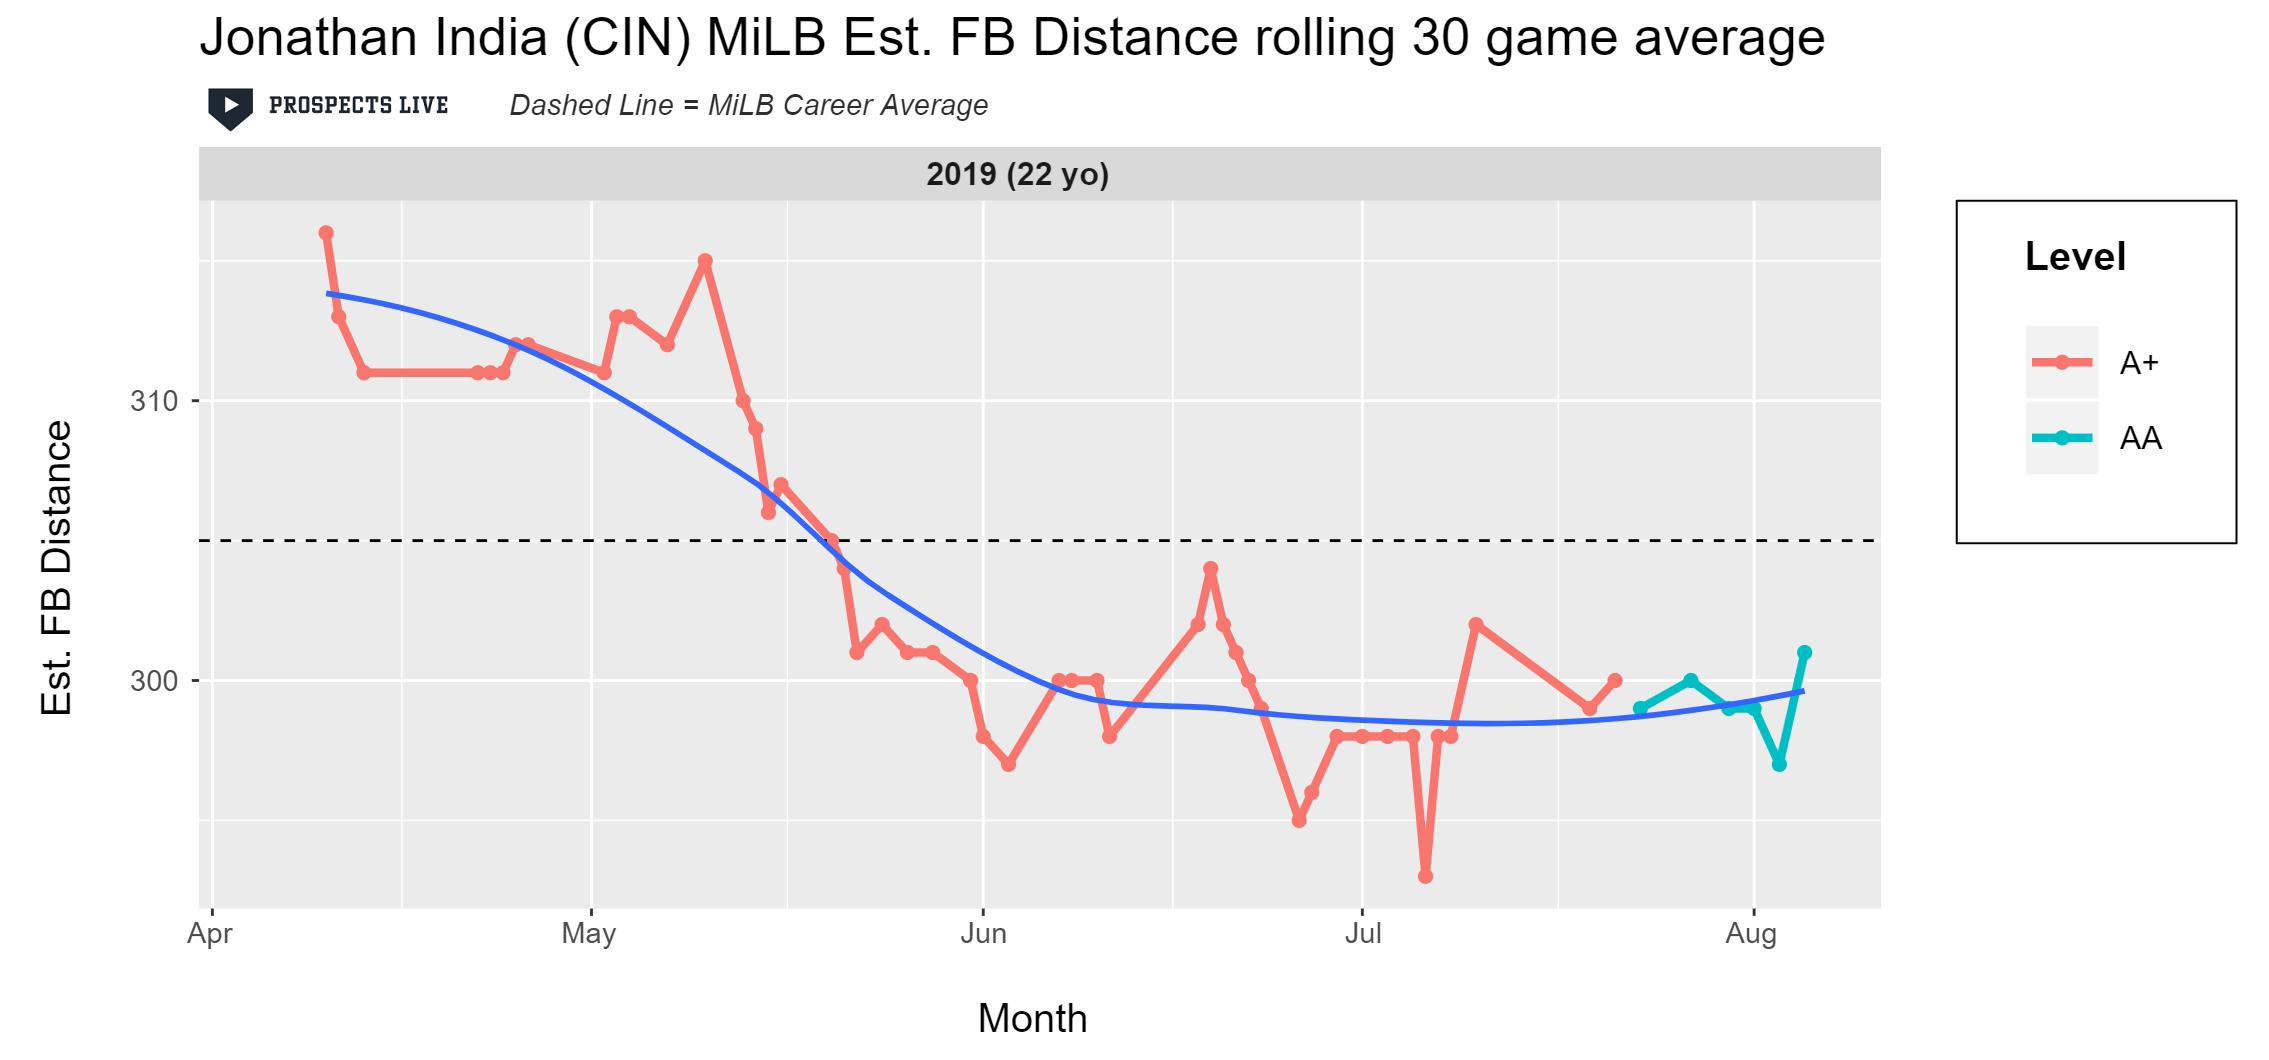 Jonathan India Estimated Fly Ball Distance